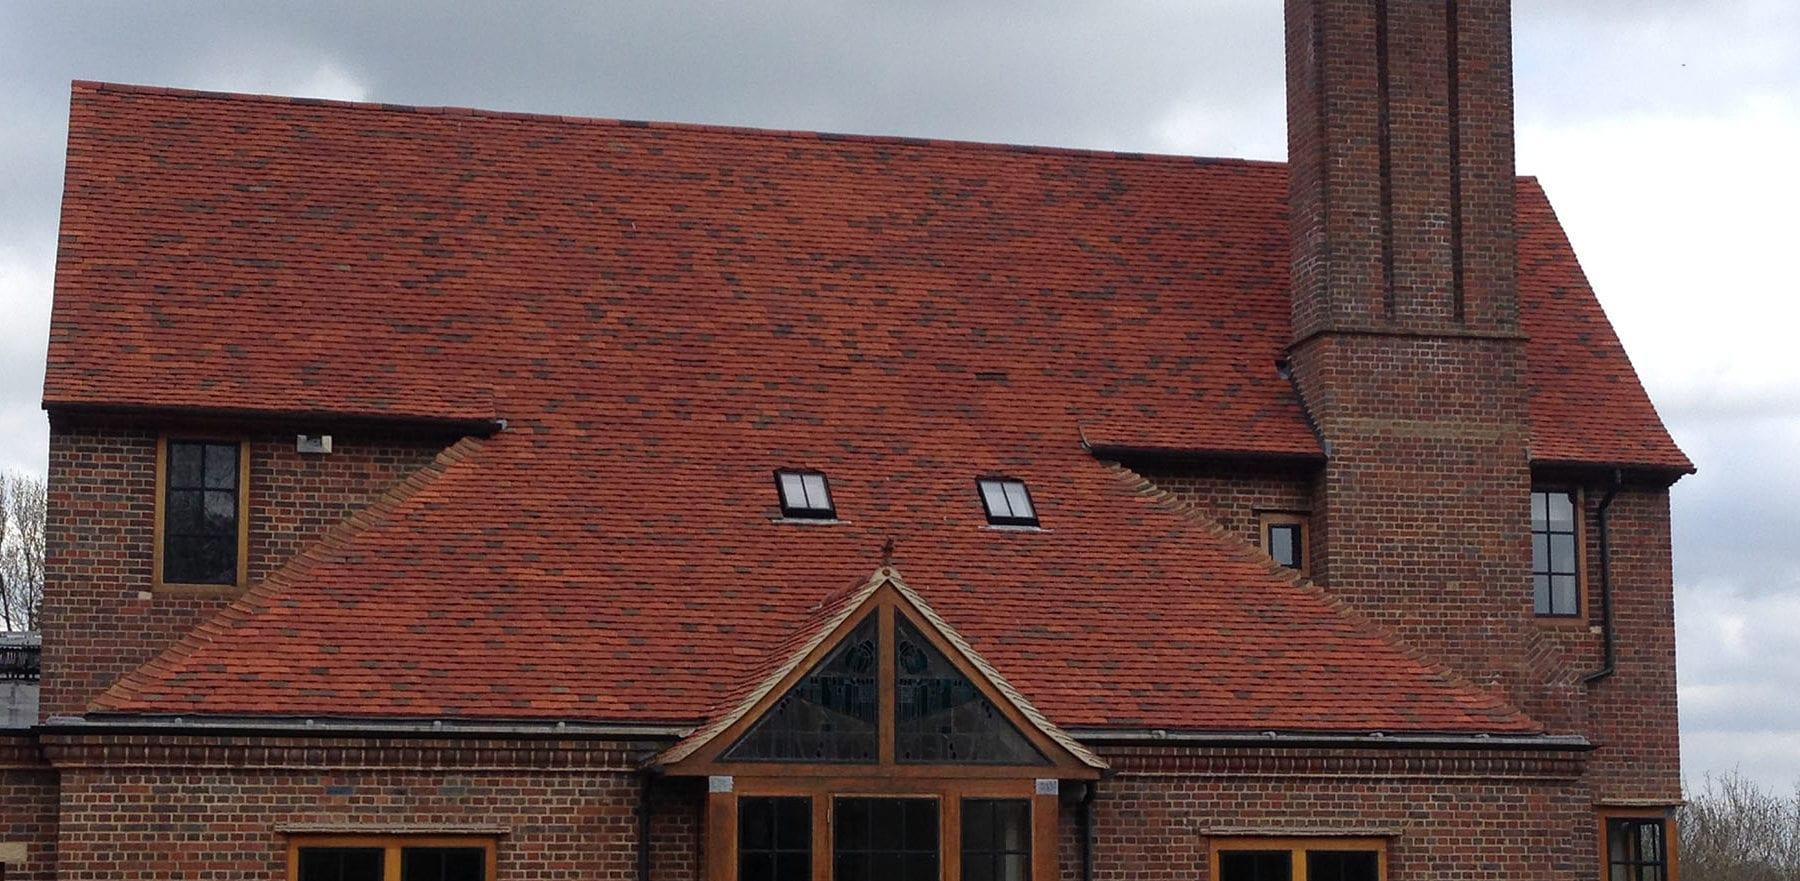 Lifestiles - Handmade Bespoke Clay Roof Tiles - Chipstead, England 3